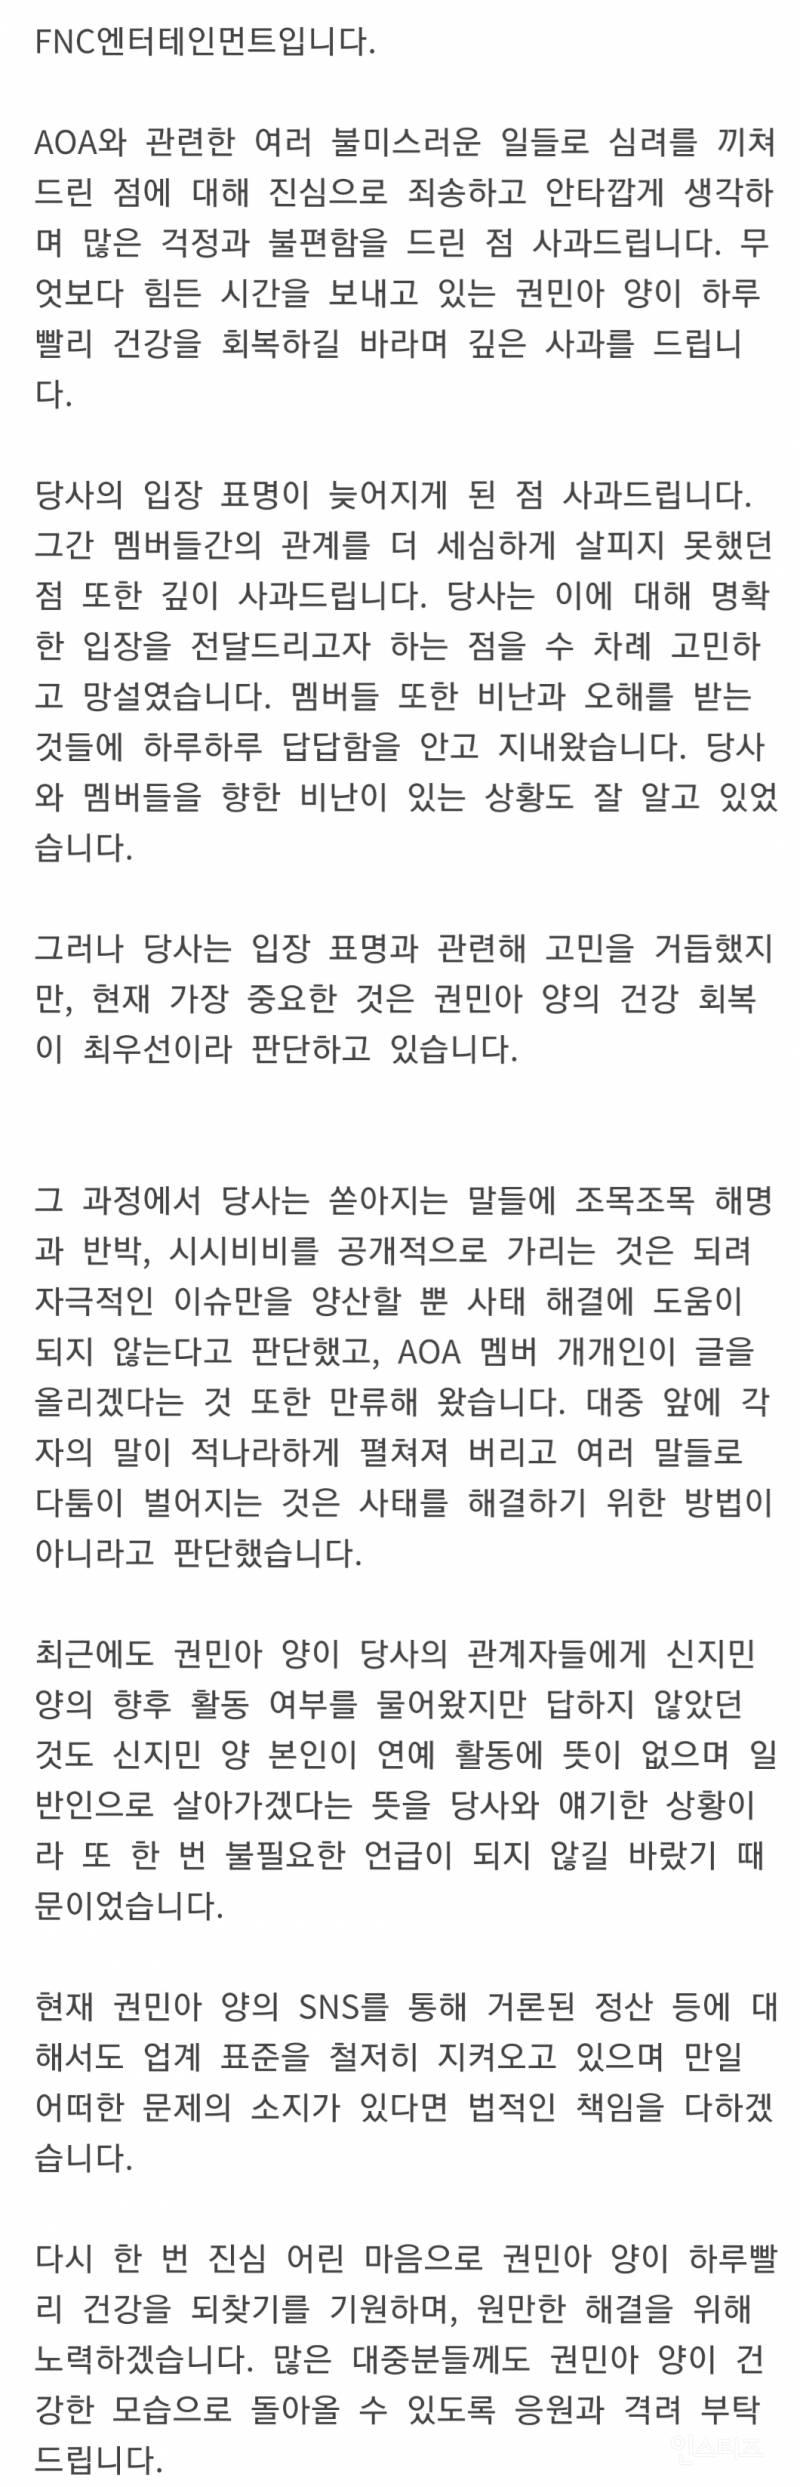 "FNC ""권민아 건강 회복 바라며 깊은 사과…AOA 멤버들 관계 세심히 못 살핀 점도 사과"" | 인스티즈"